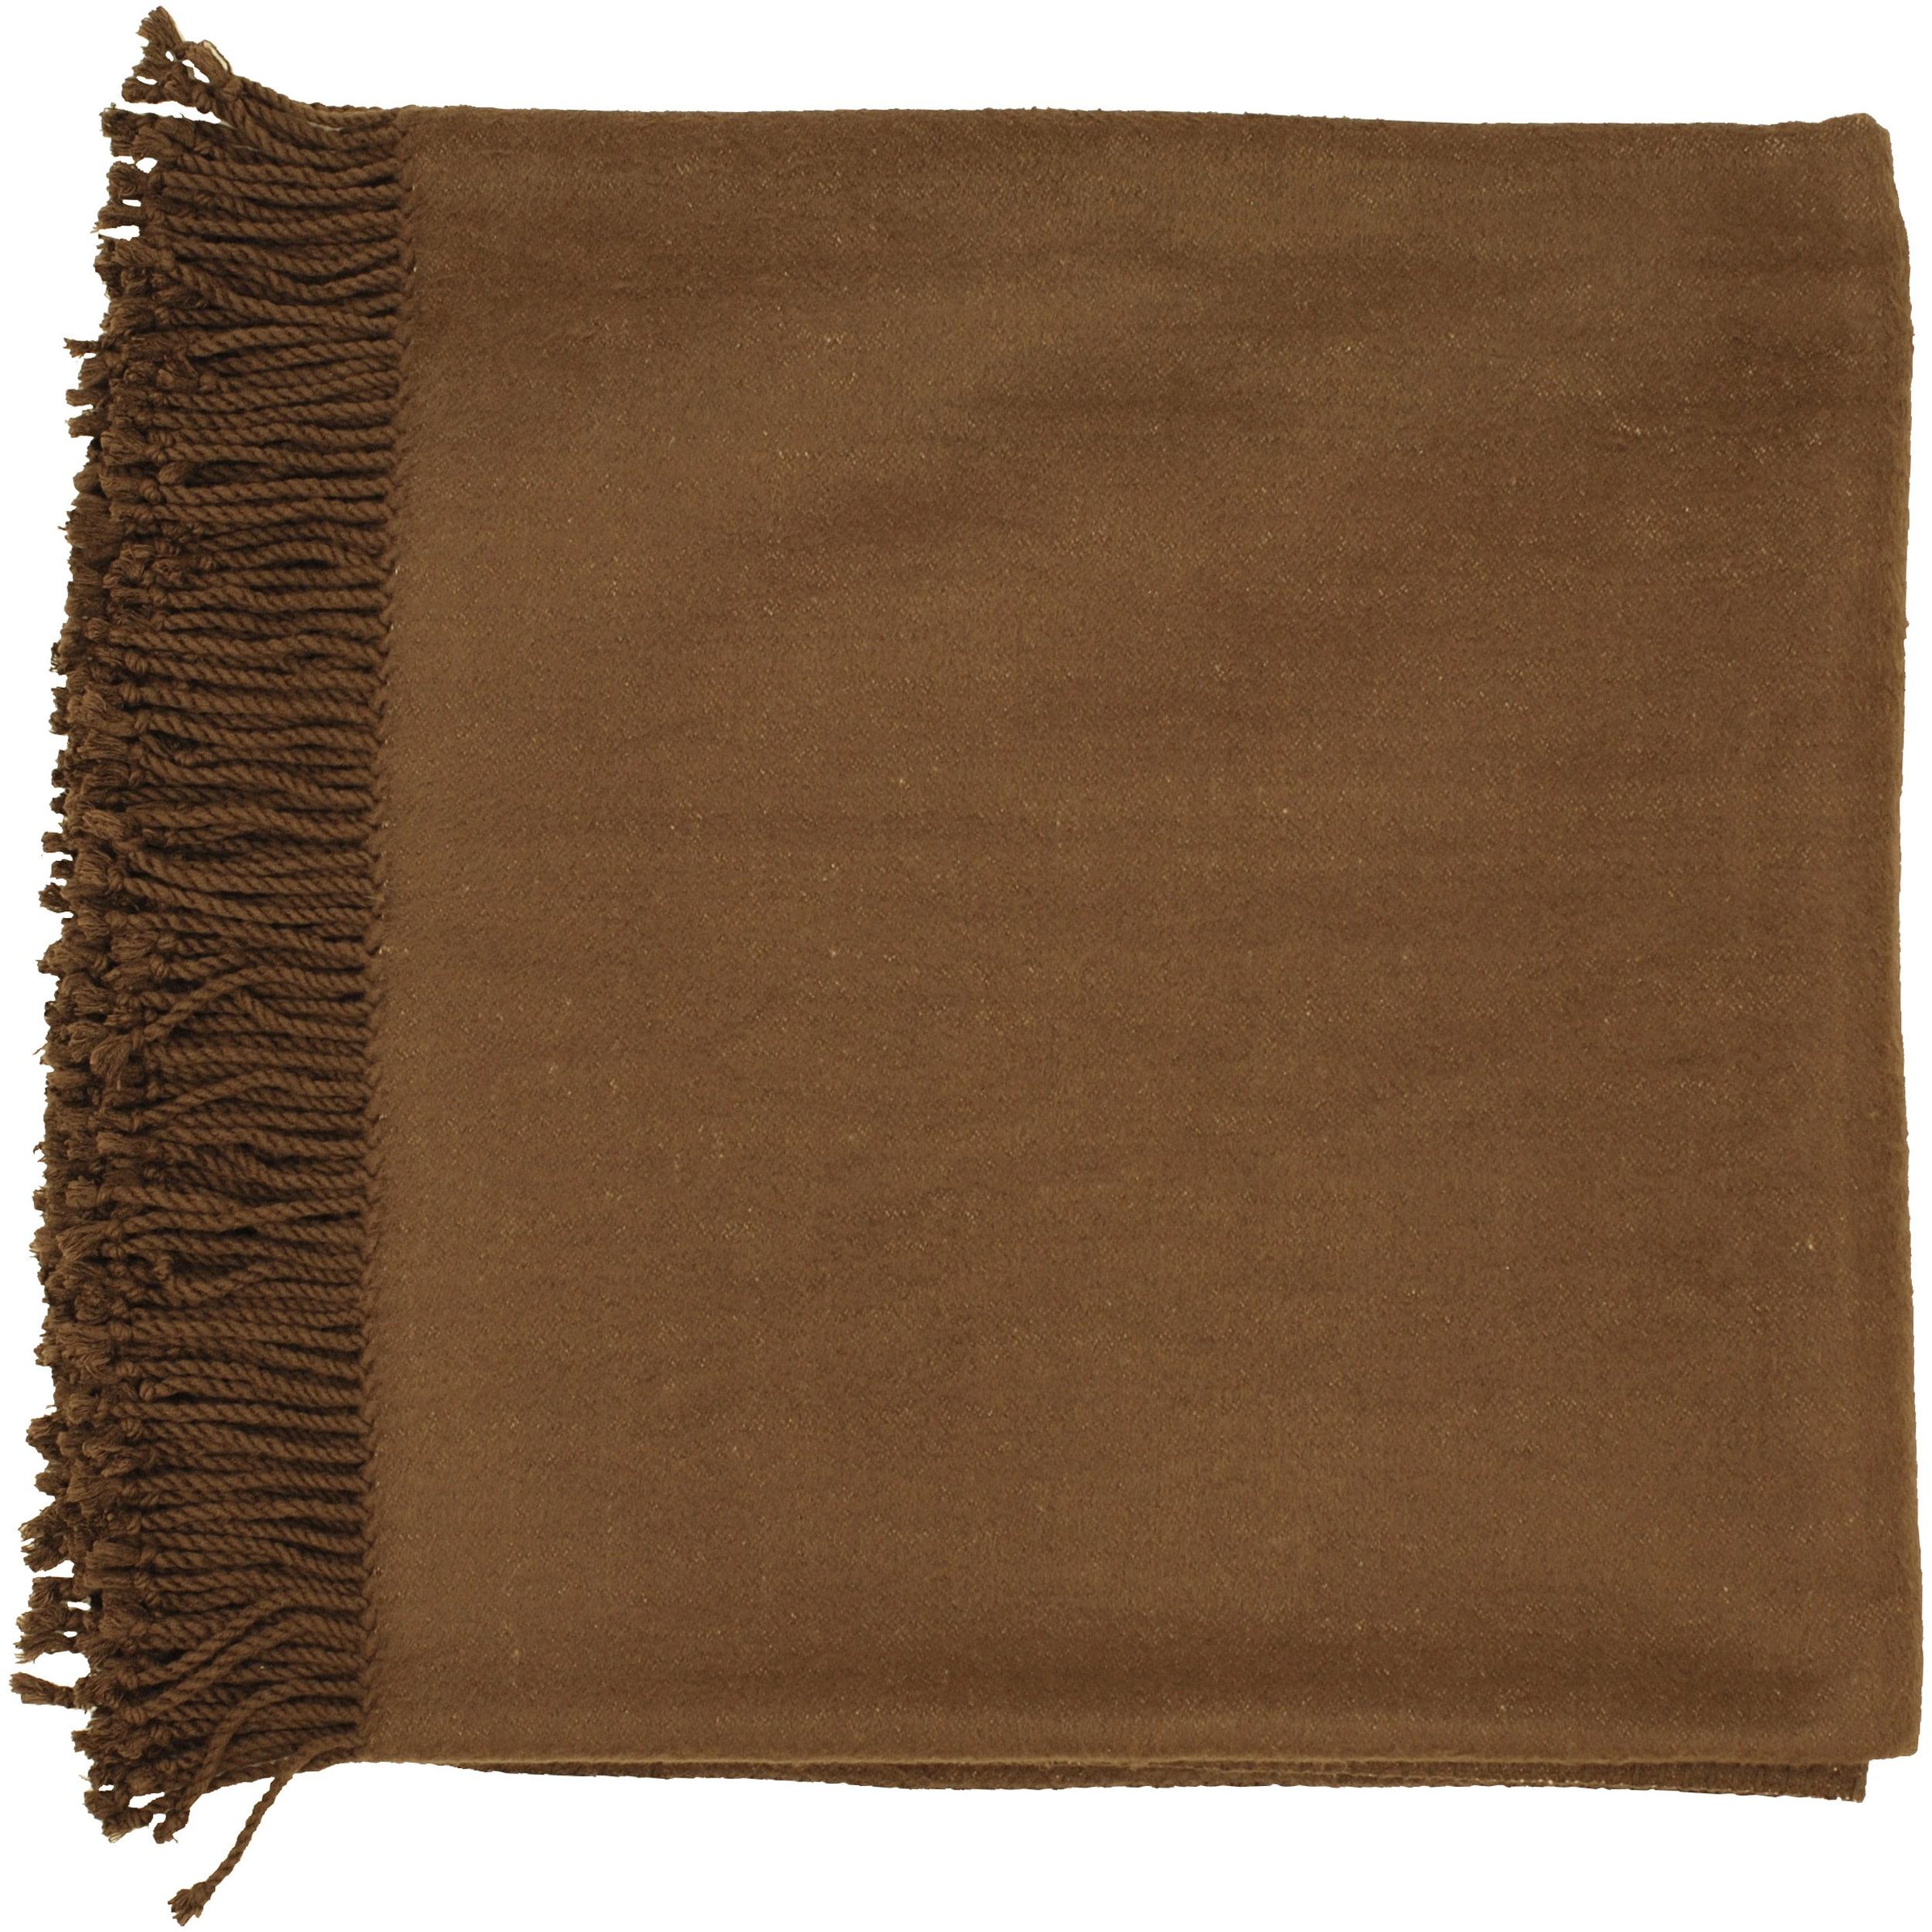 Veni Woven Rayon from Bamboo Cotton Throw